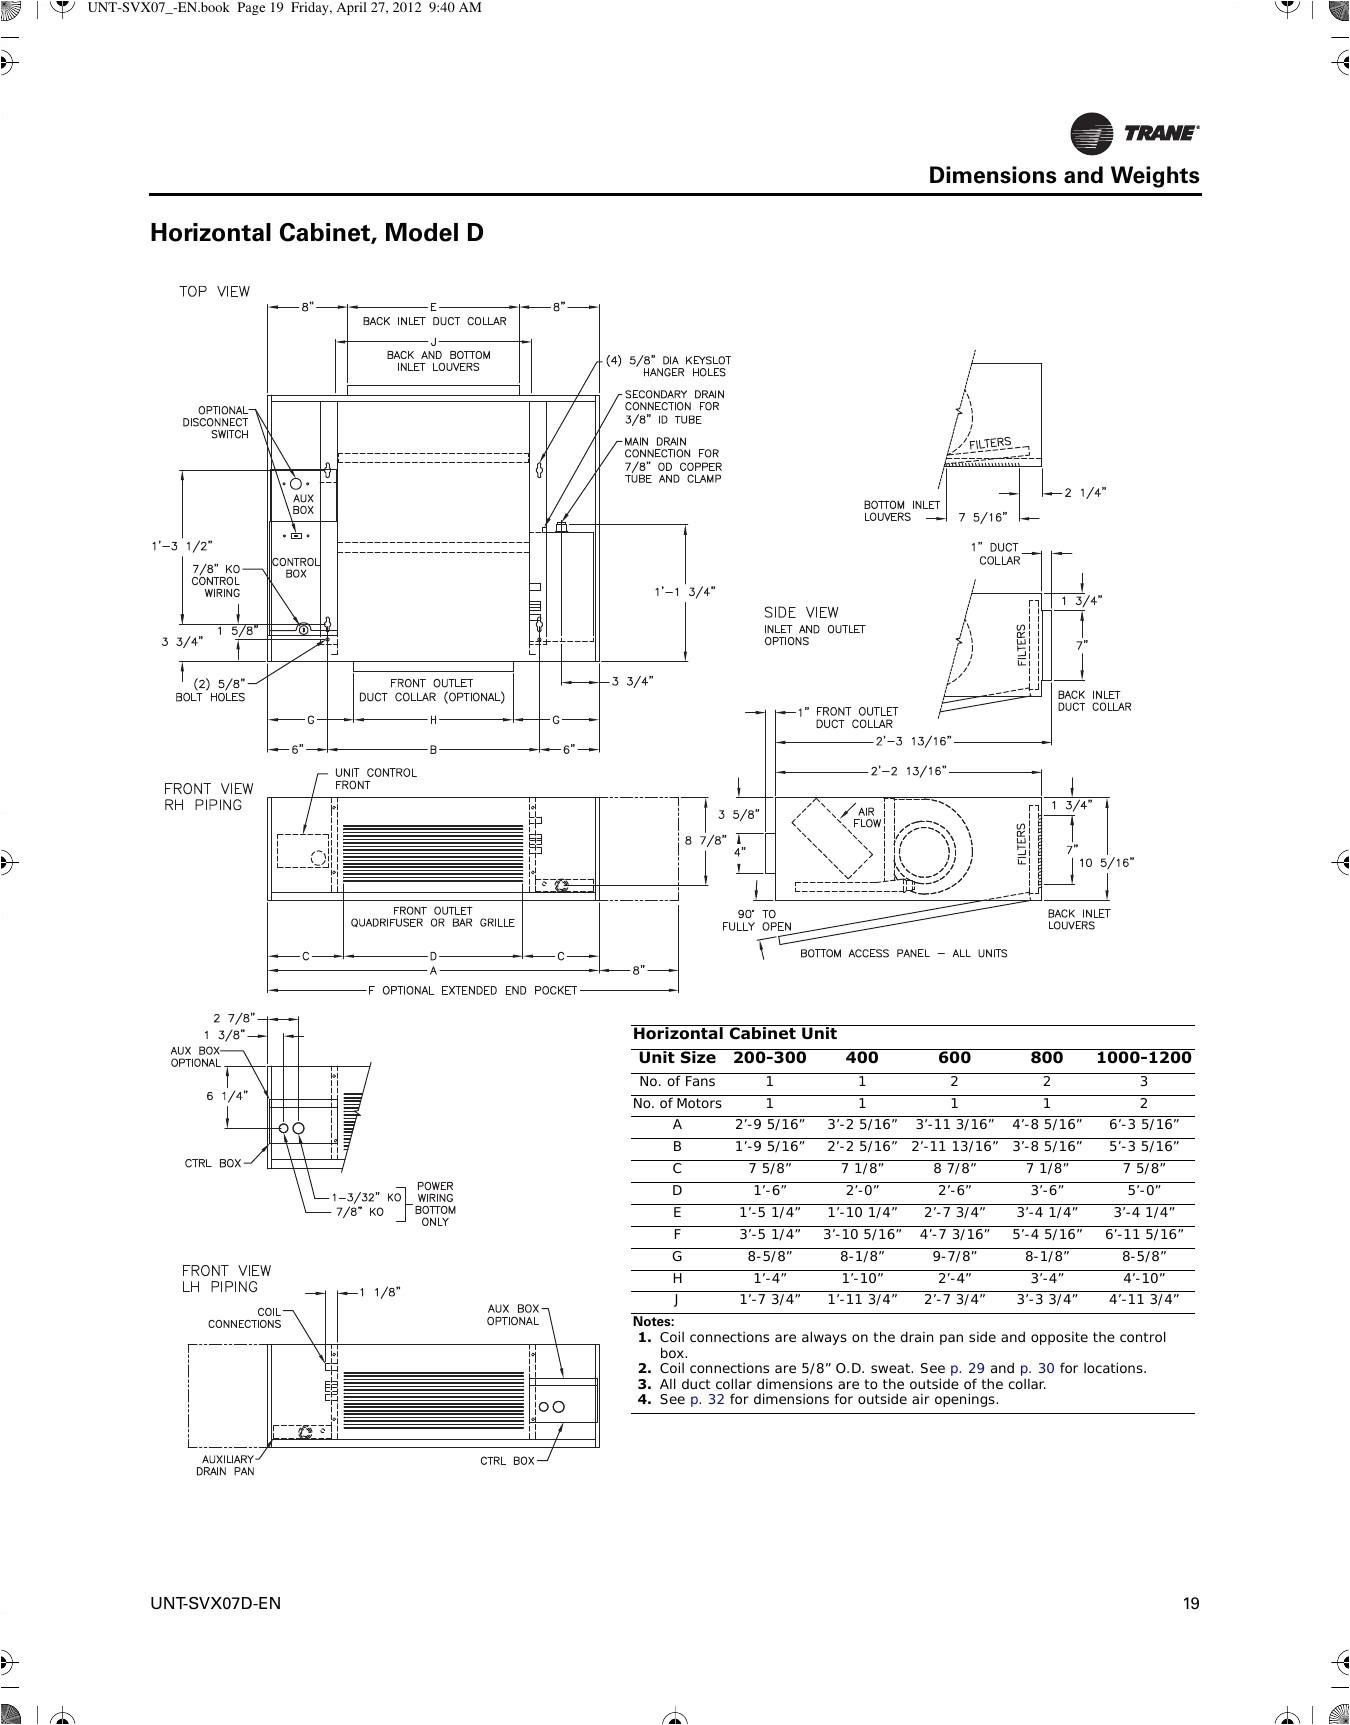 honeywell heat pump thermostat wiring diagram unique honeywellhoneywell heat pump thermostat wiring diagram unique honeywell thermostat